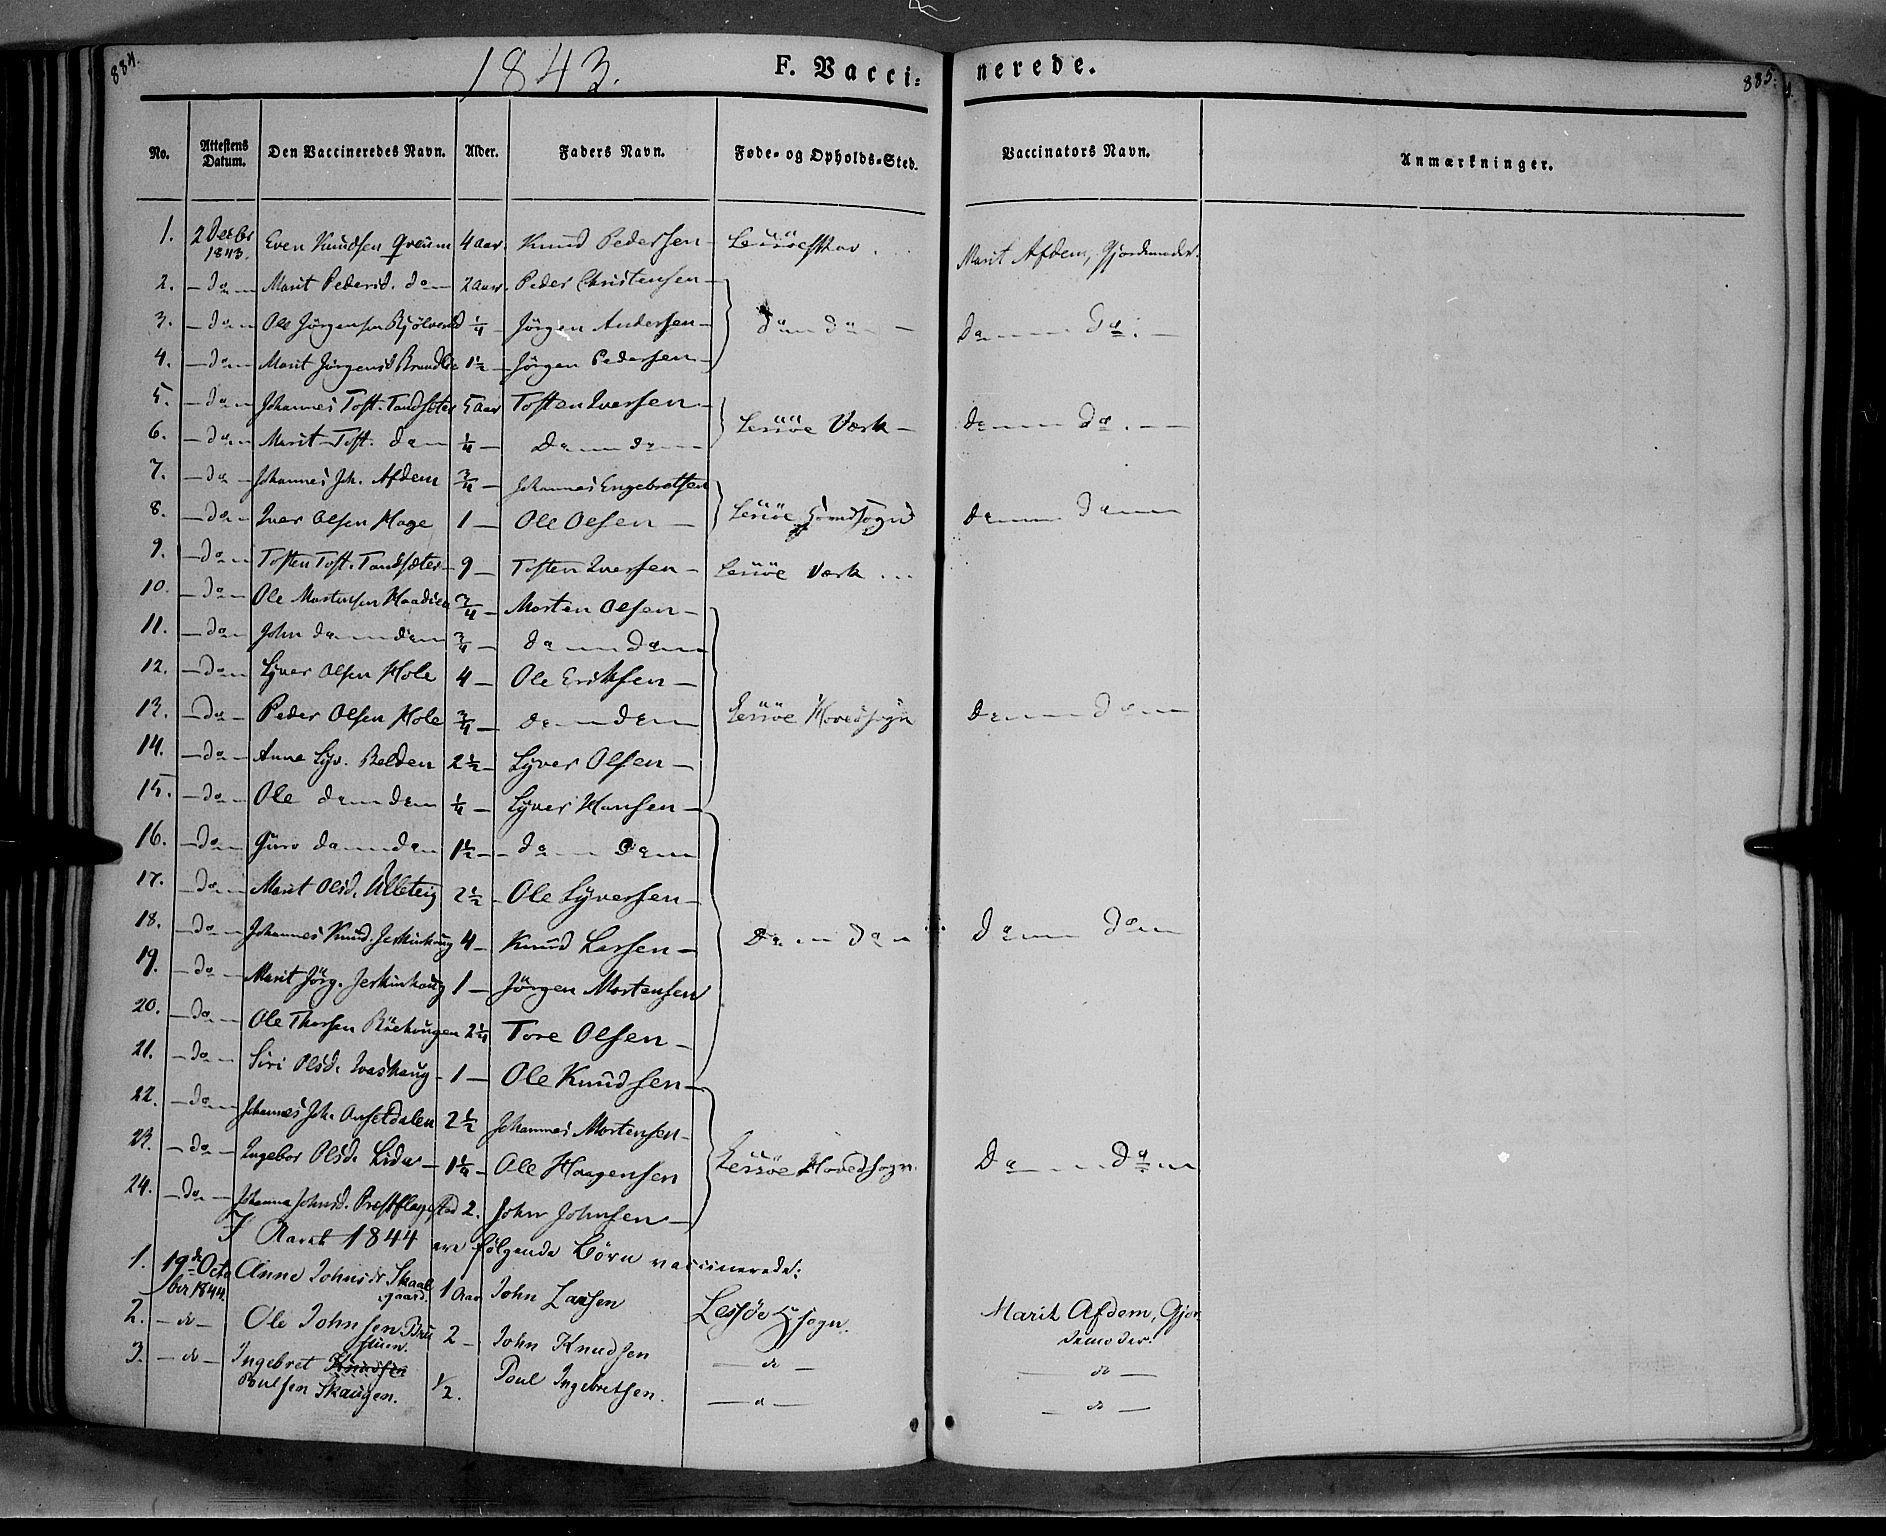 SAH, Lesja prestekontor, Ministerialbok nr. 6B, 1843-1854, s. 884-885